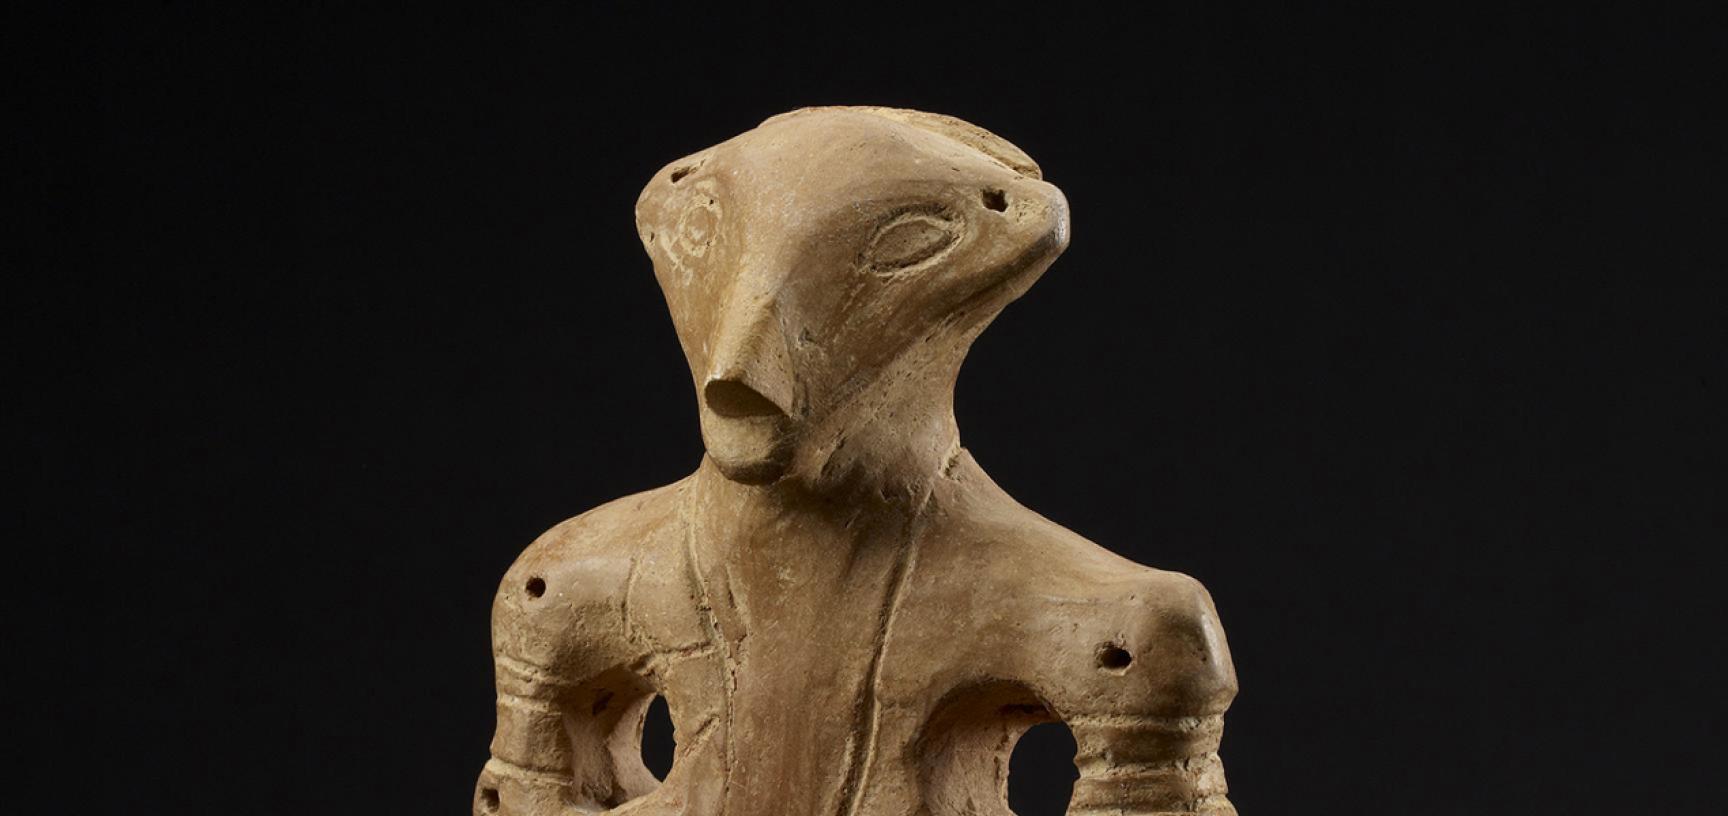 European Prehistory at the Ashmolean Museum